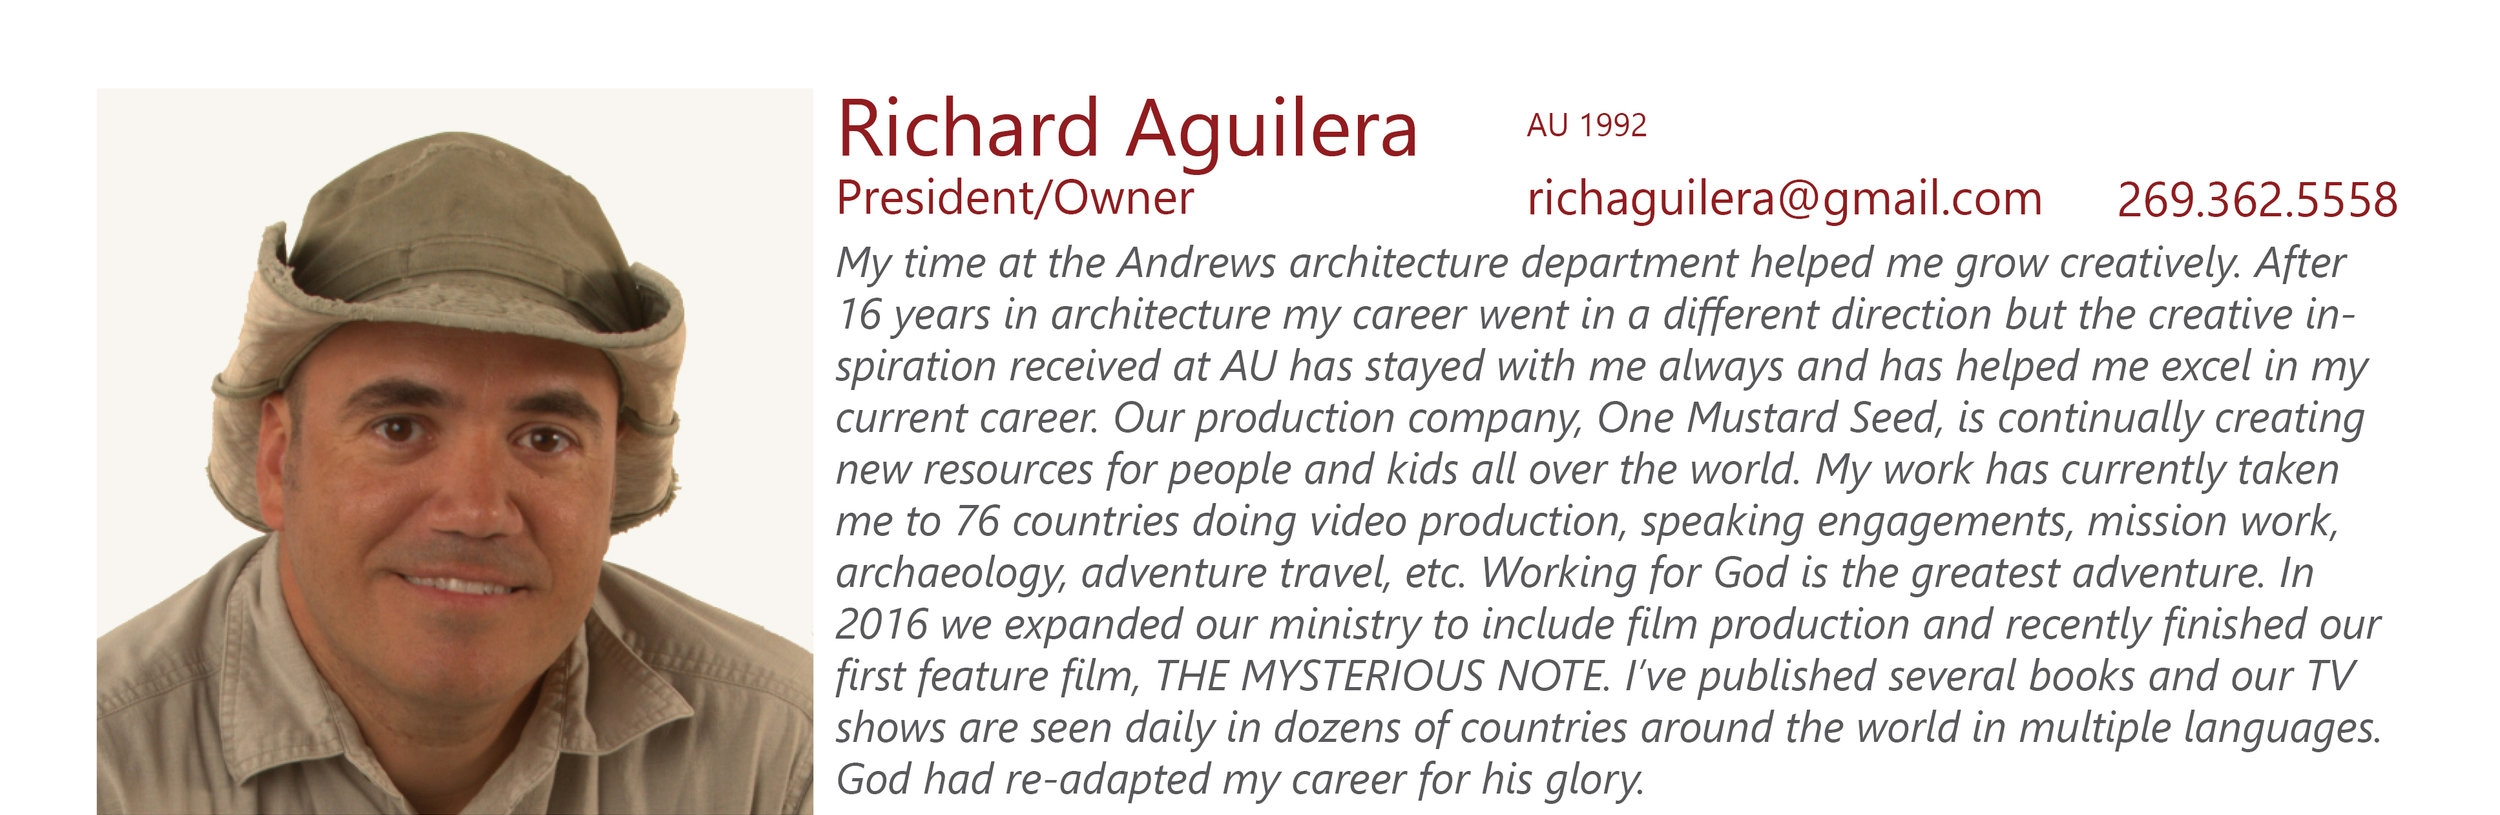 Richard Aguilera.jpg